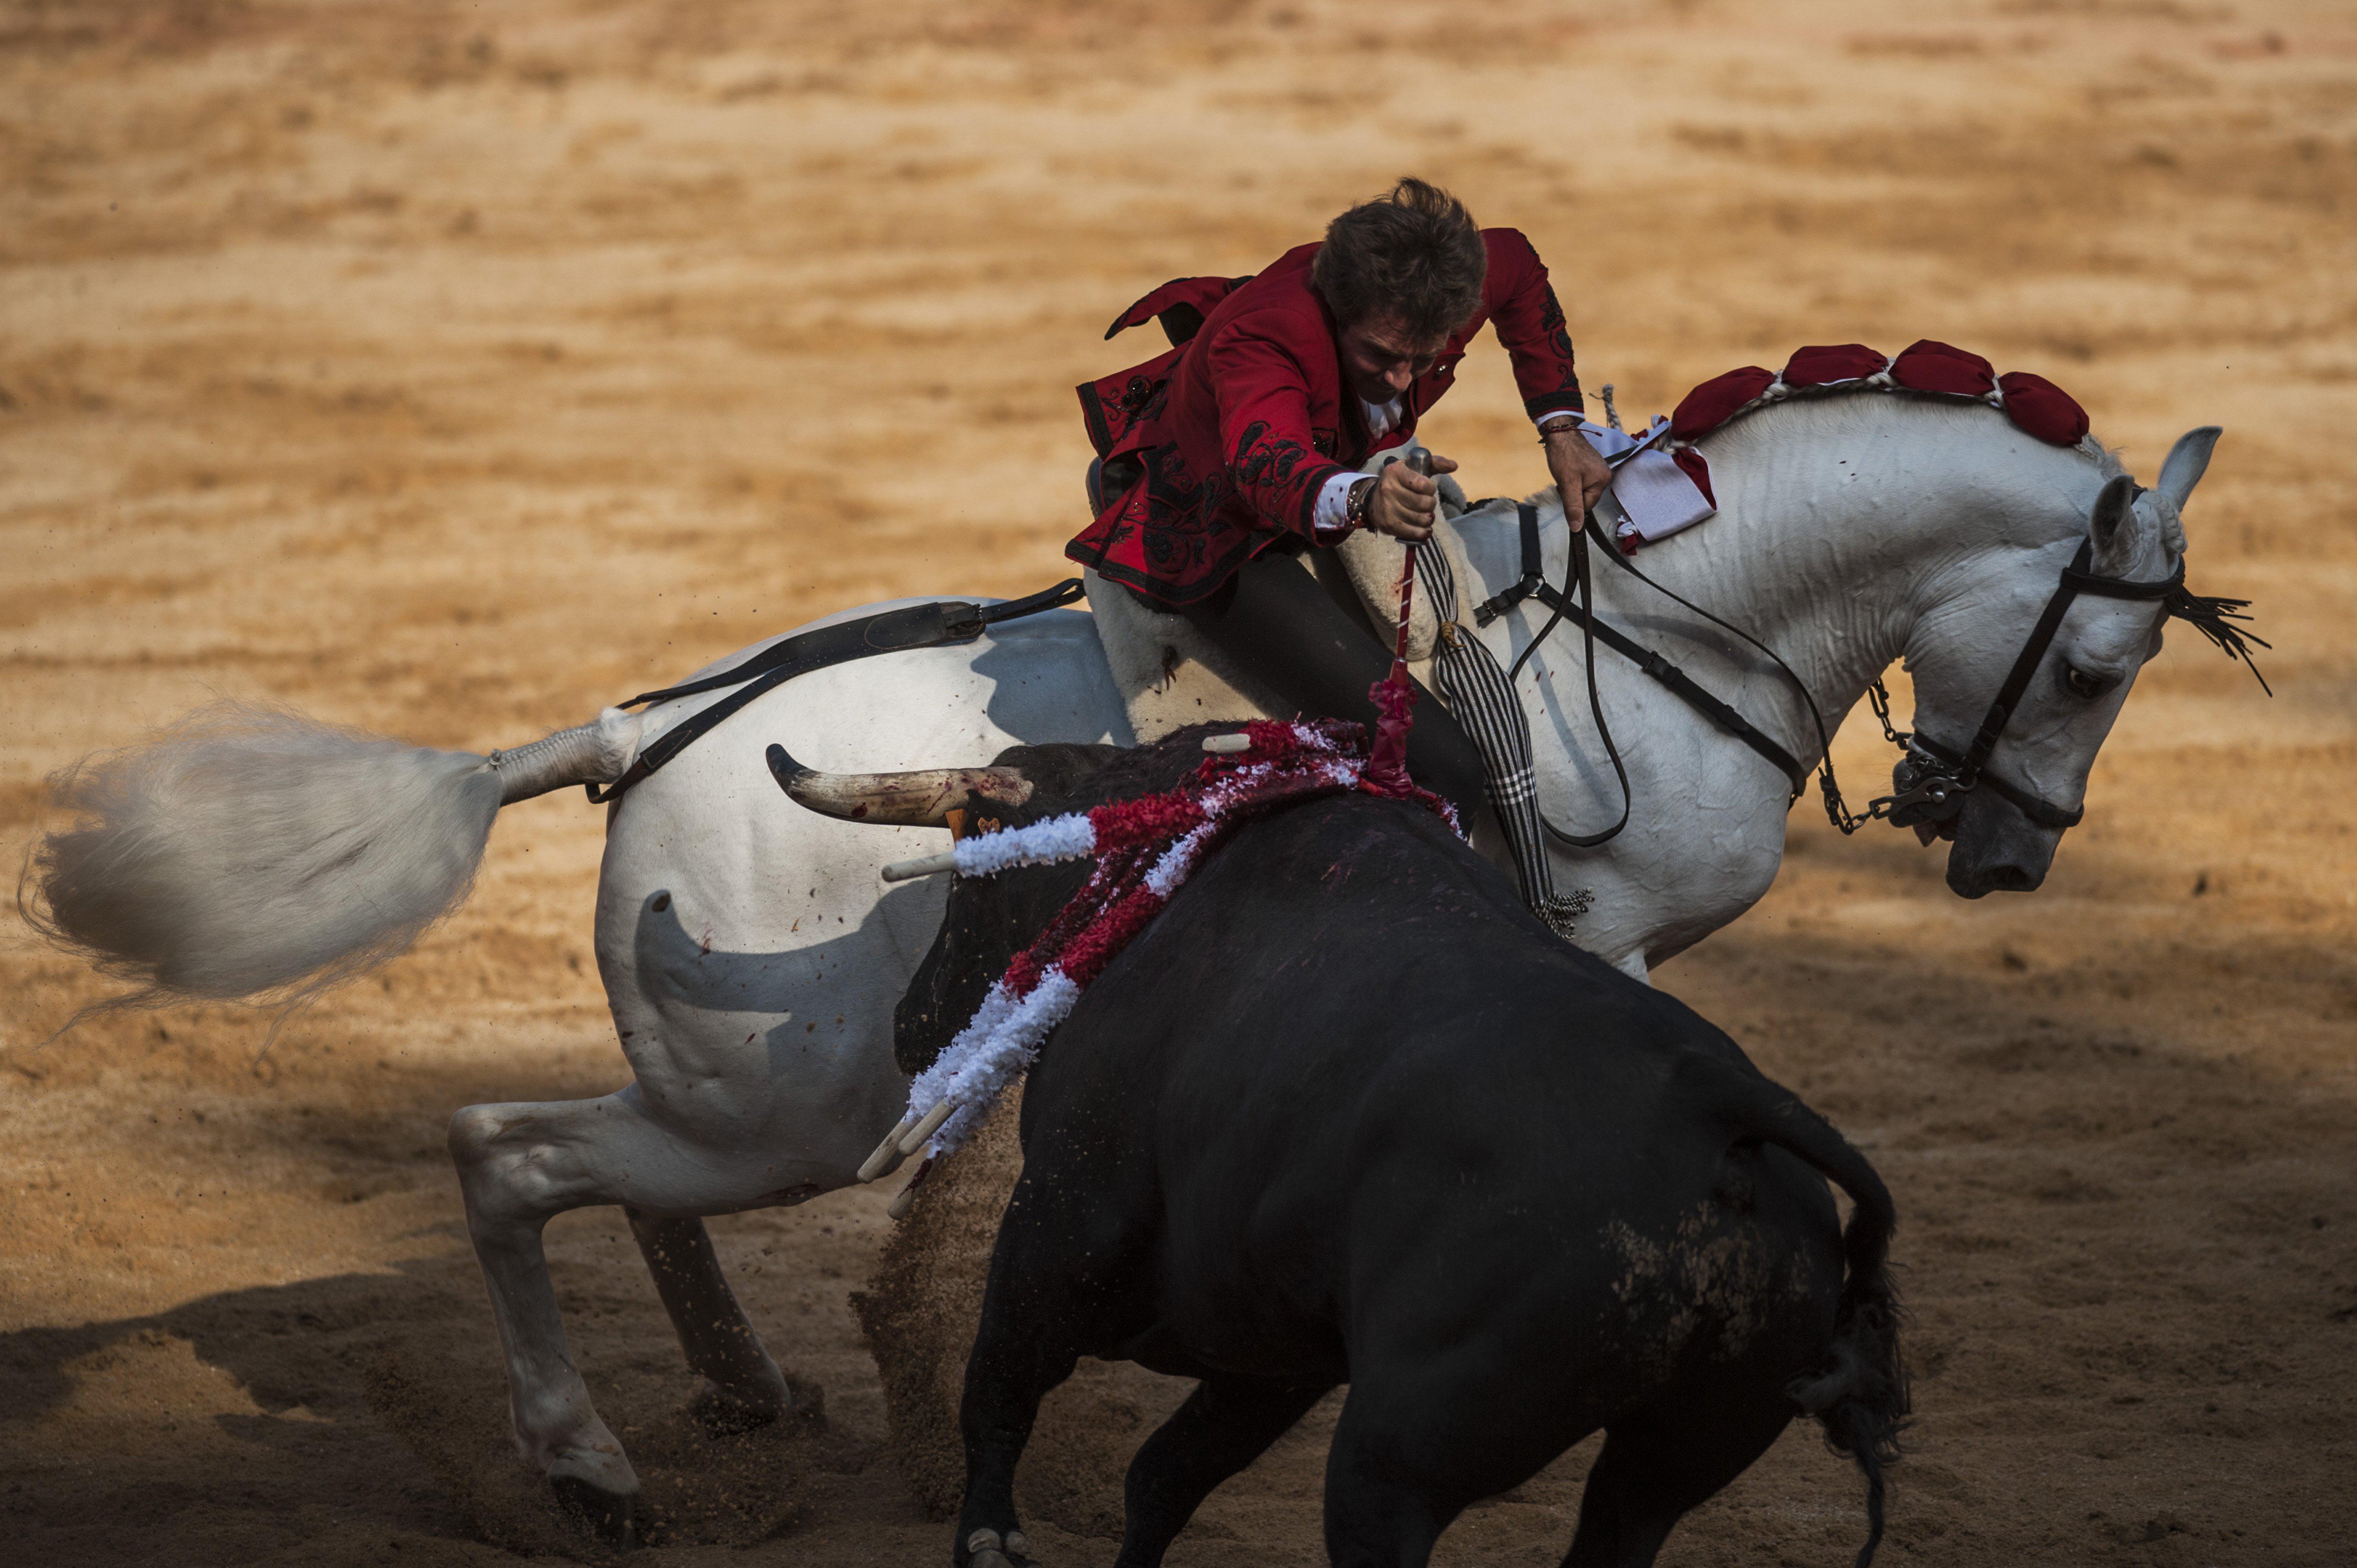 Spanish mounted bullfighter Pablo Hermoso de Mendoza performs during a horseback bullfight at San Fermin Fiestas, in Pamplona, Spain on July 6, 2015.